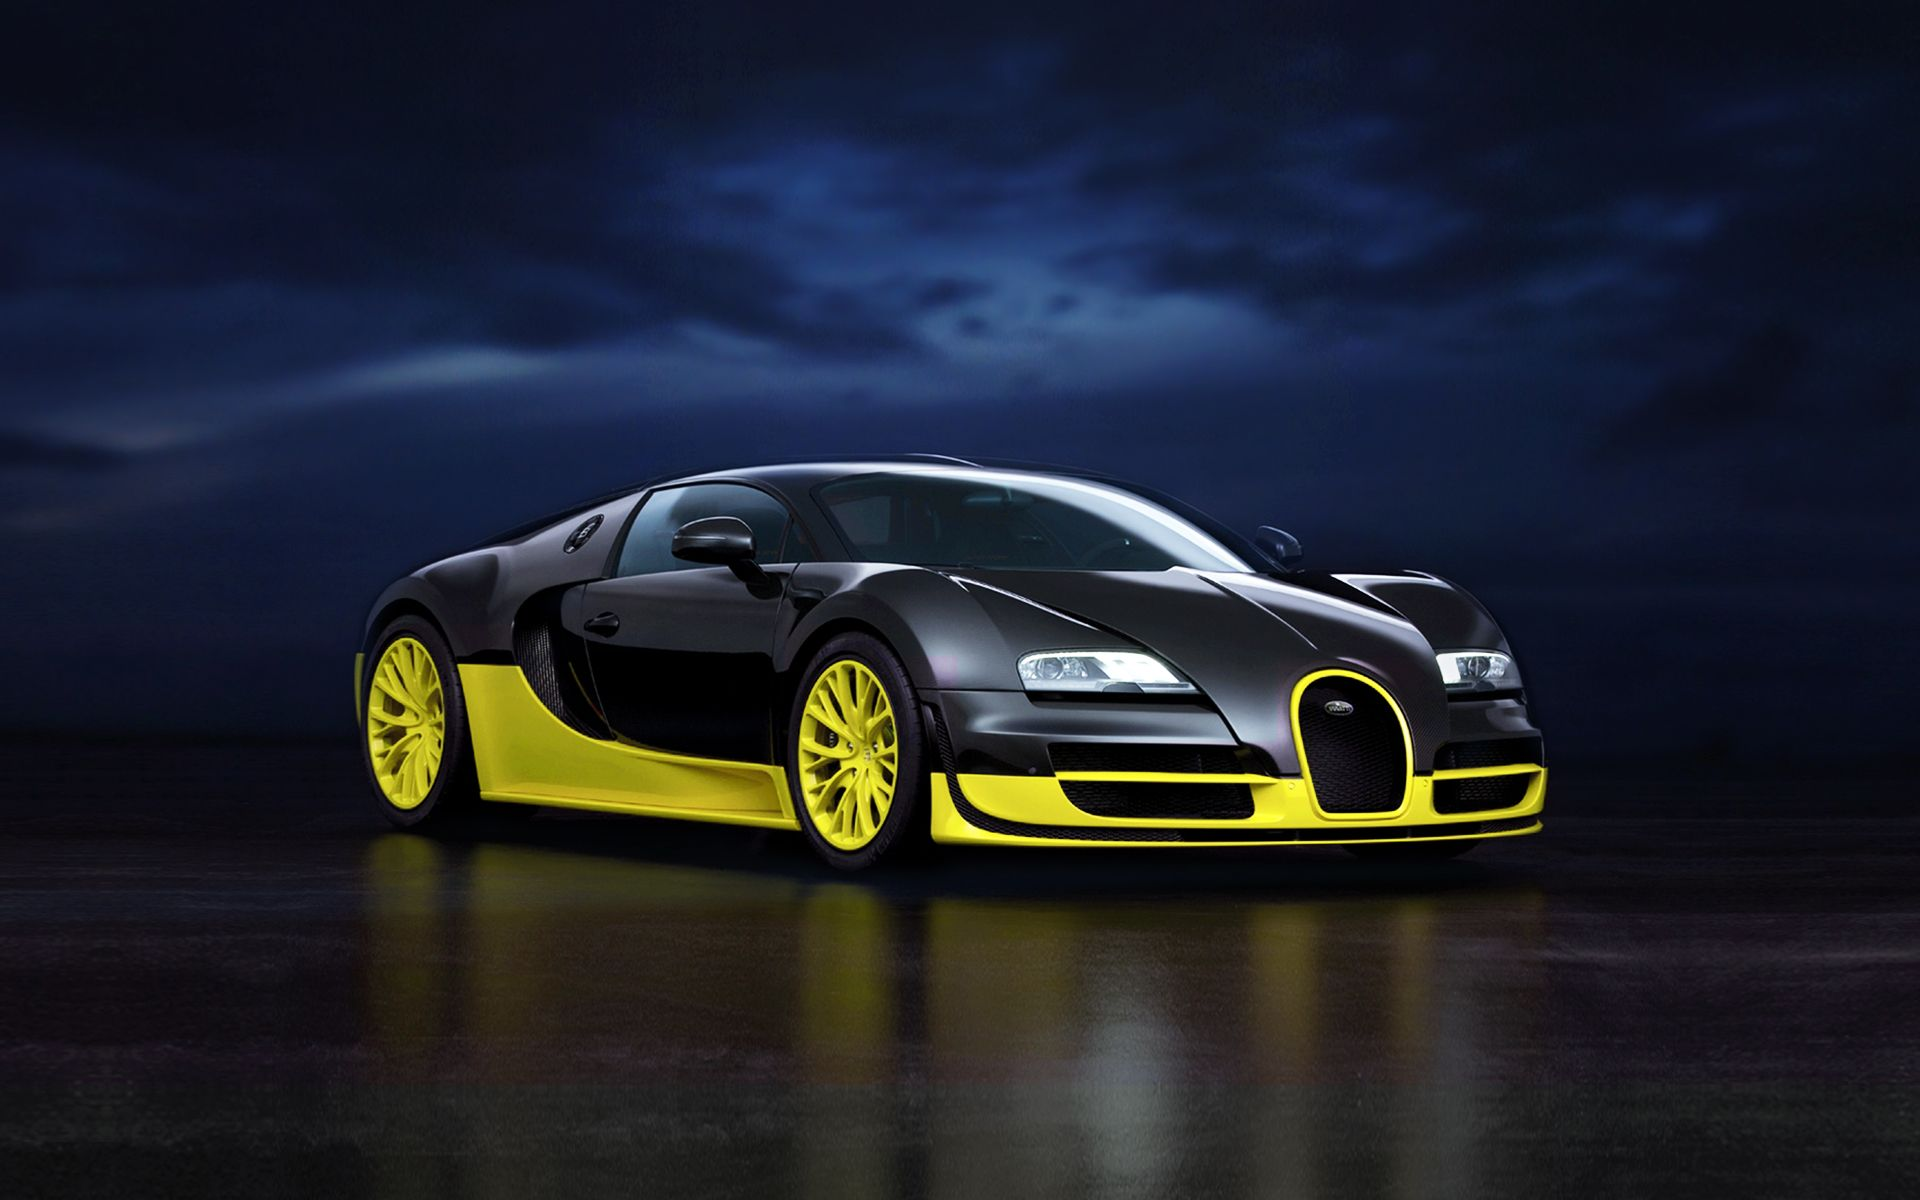 Bugatti Veyron Super Sports 2 4 Million Bugatti Veyron Super Sport Sports Cars Bugatti Super Sport Cars